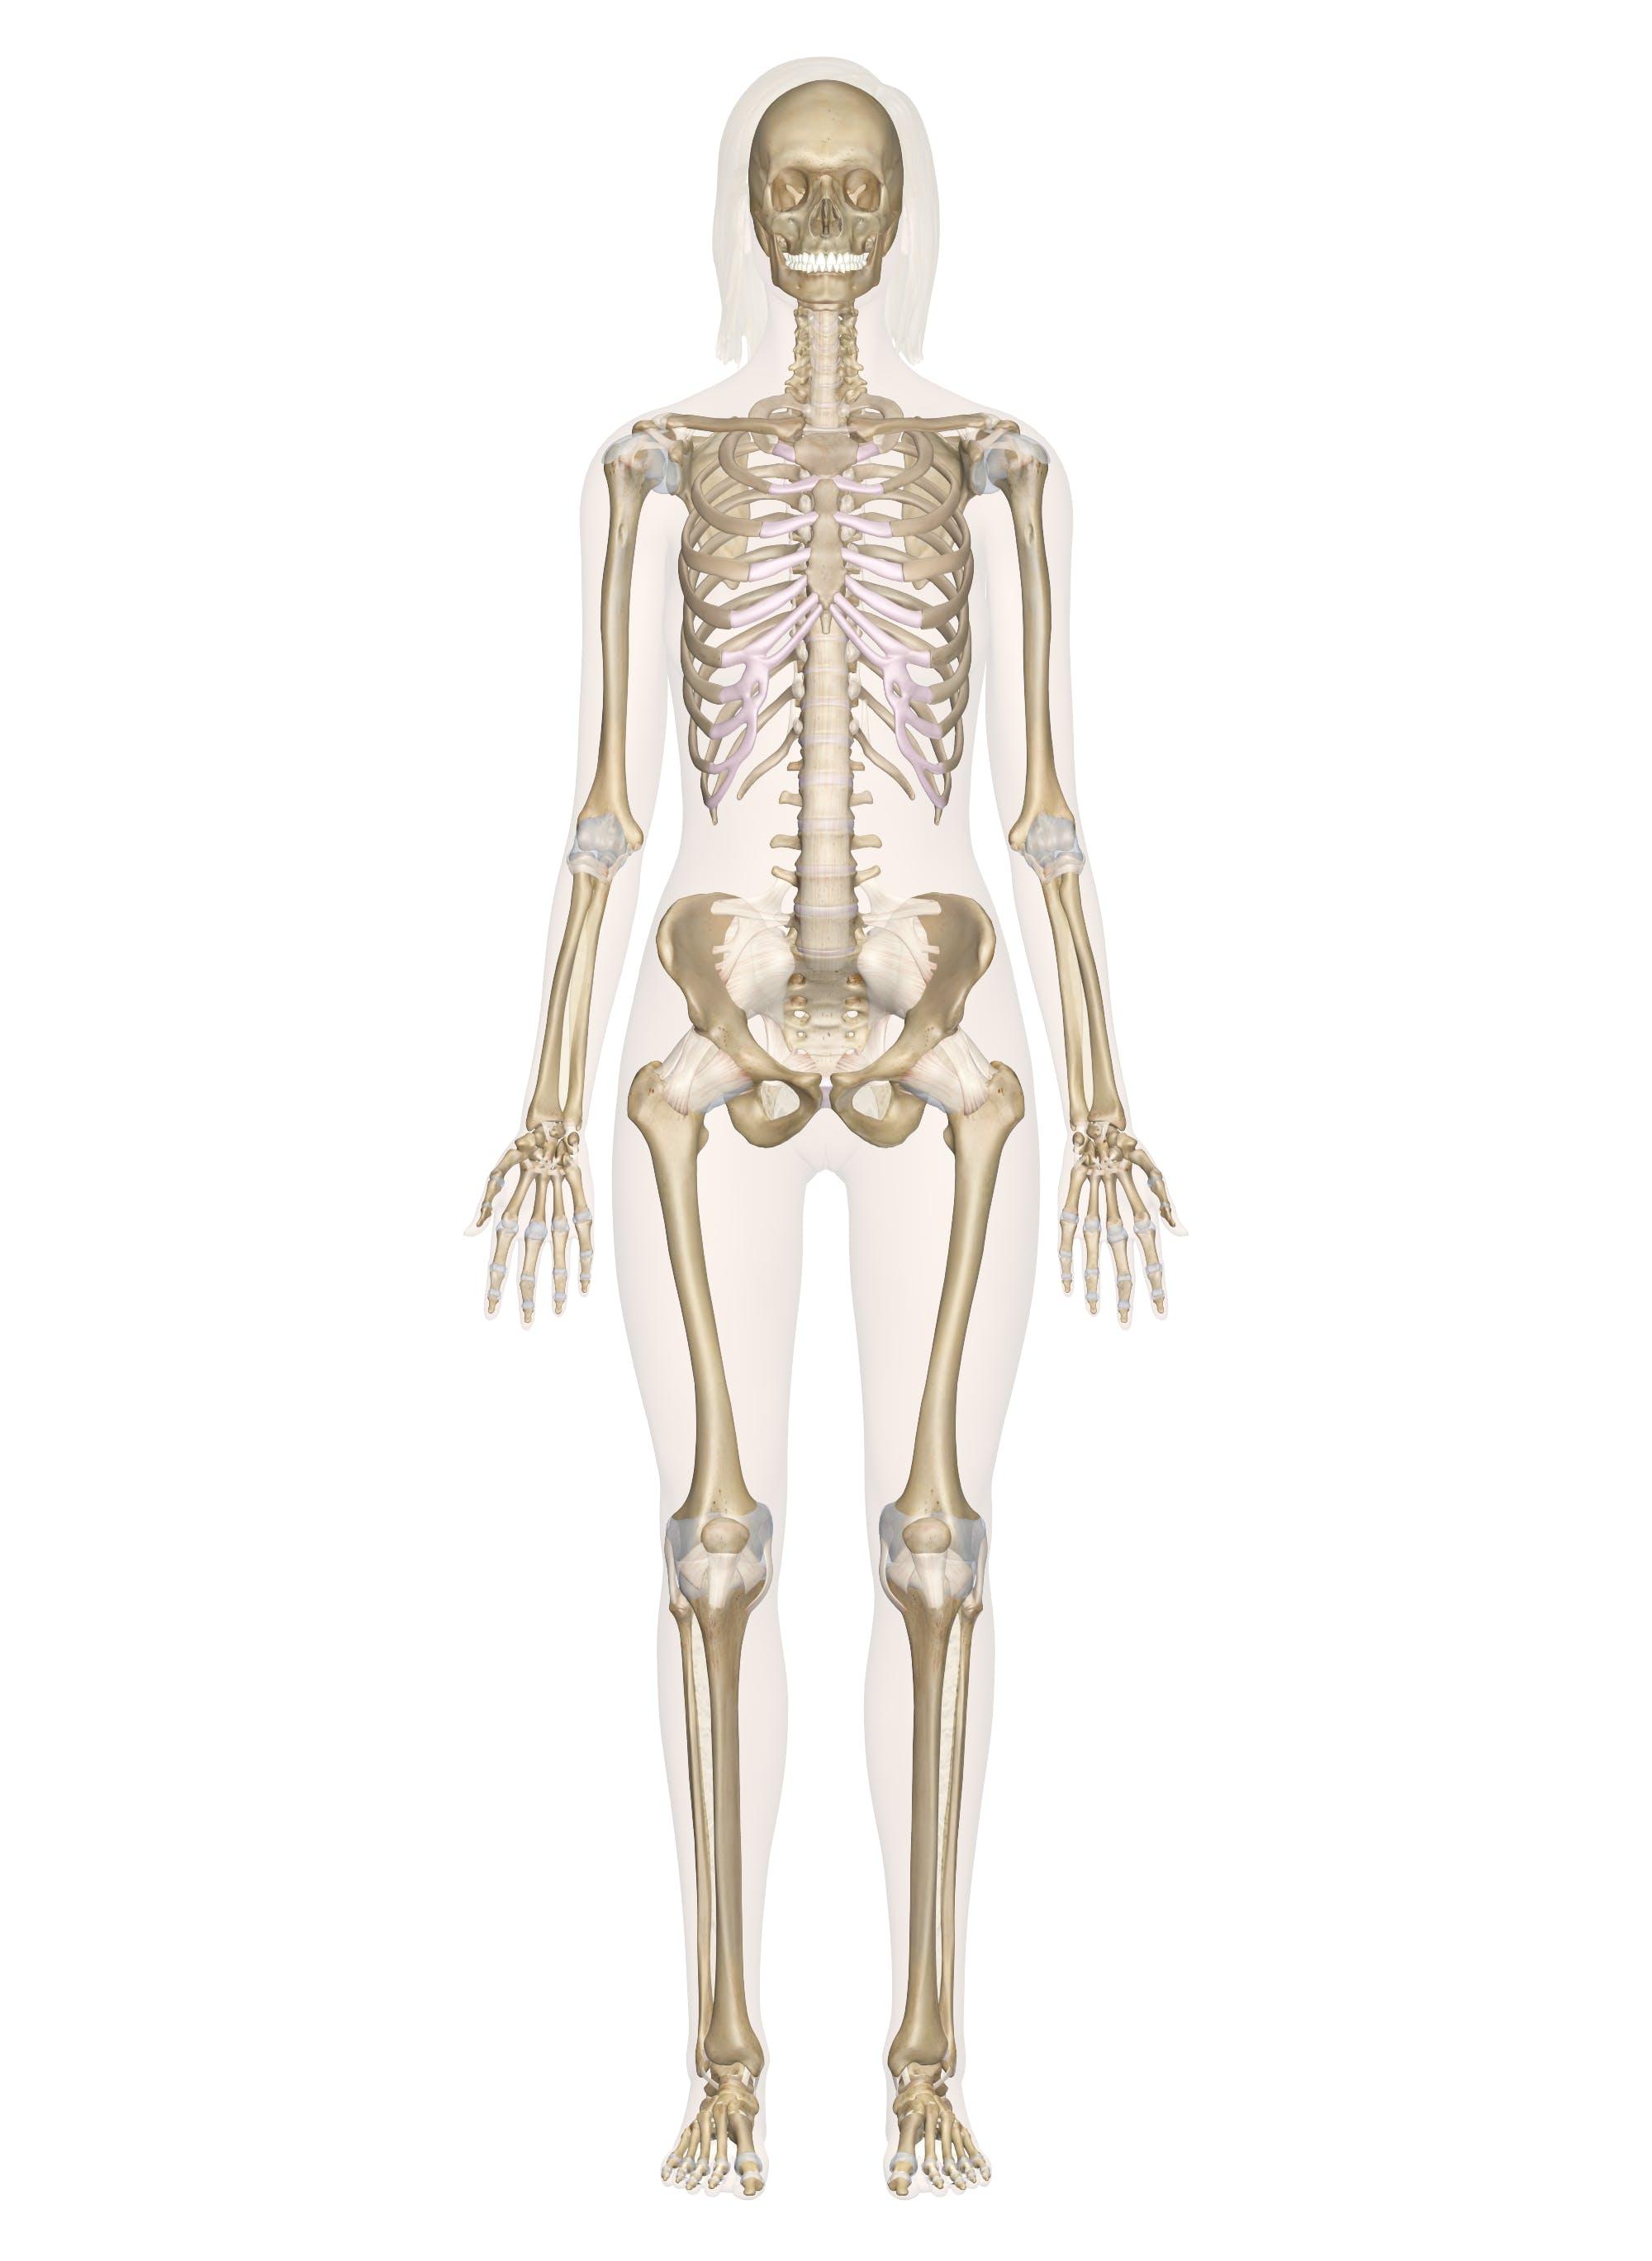 Skeletal System – Labeled Diagrams of the Human Skeleton